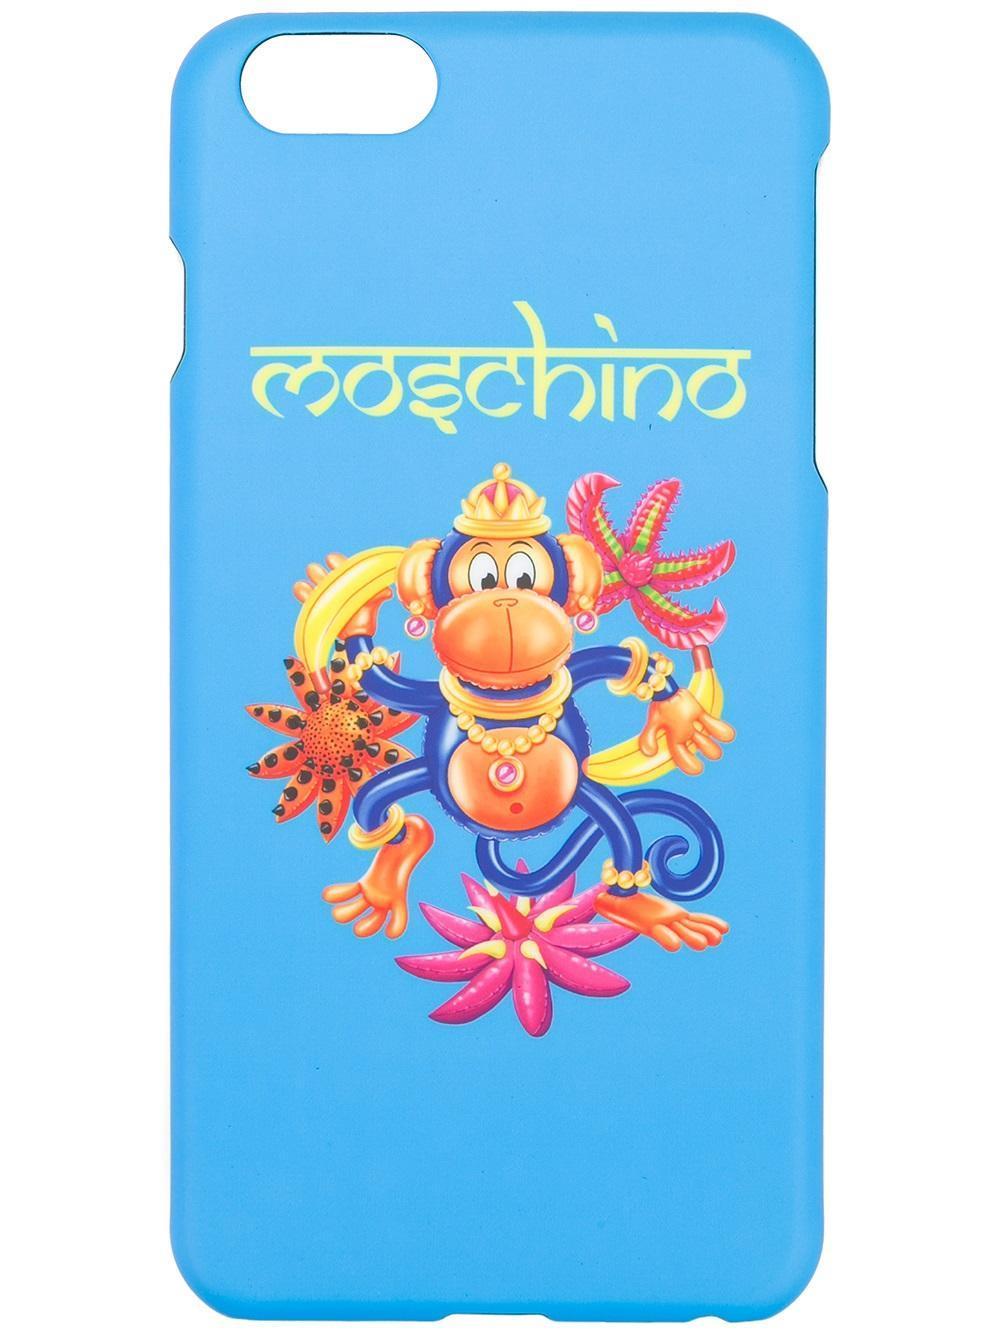 Moschino Phone Case Iphone S Plus